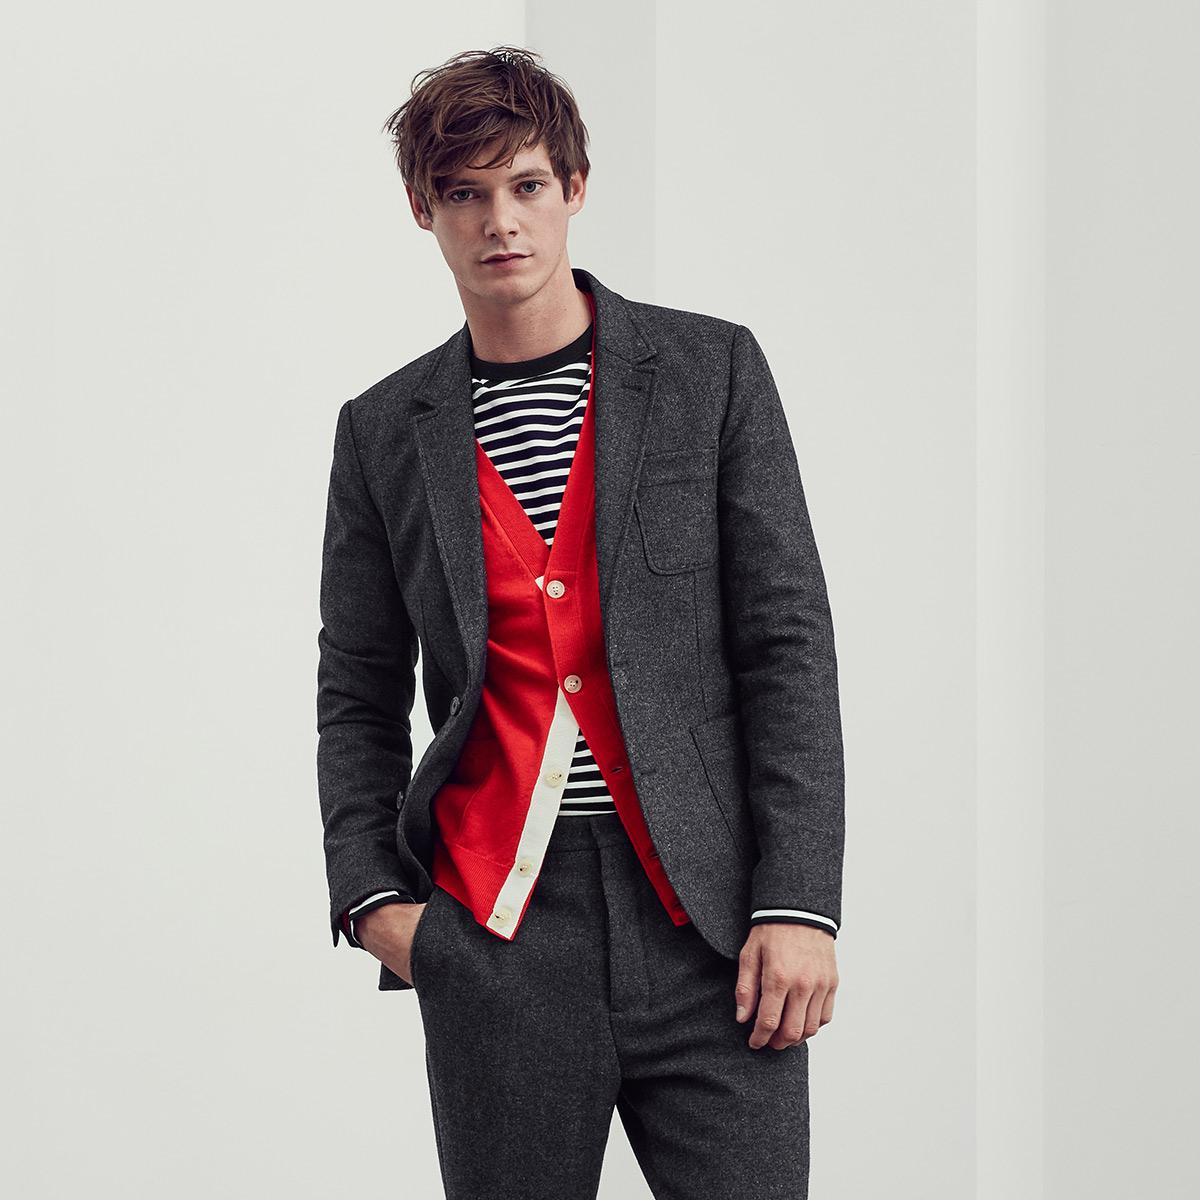 Men's Grey AMI suit